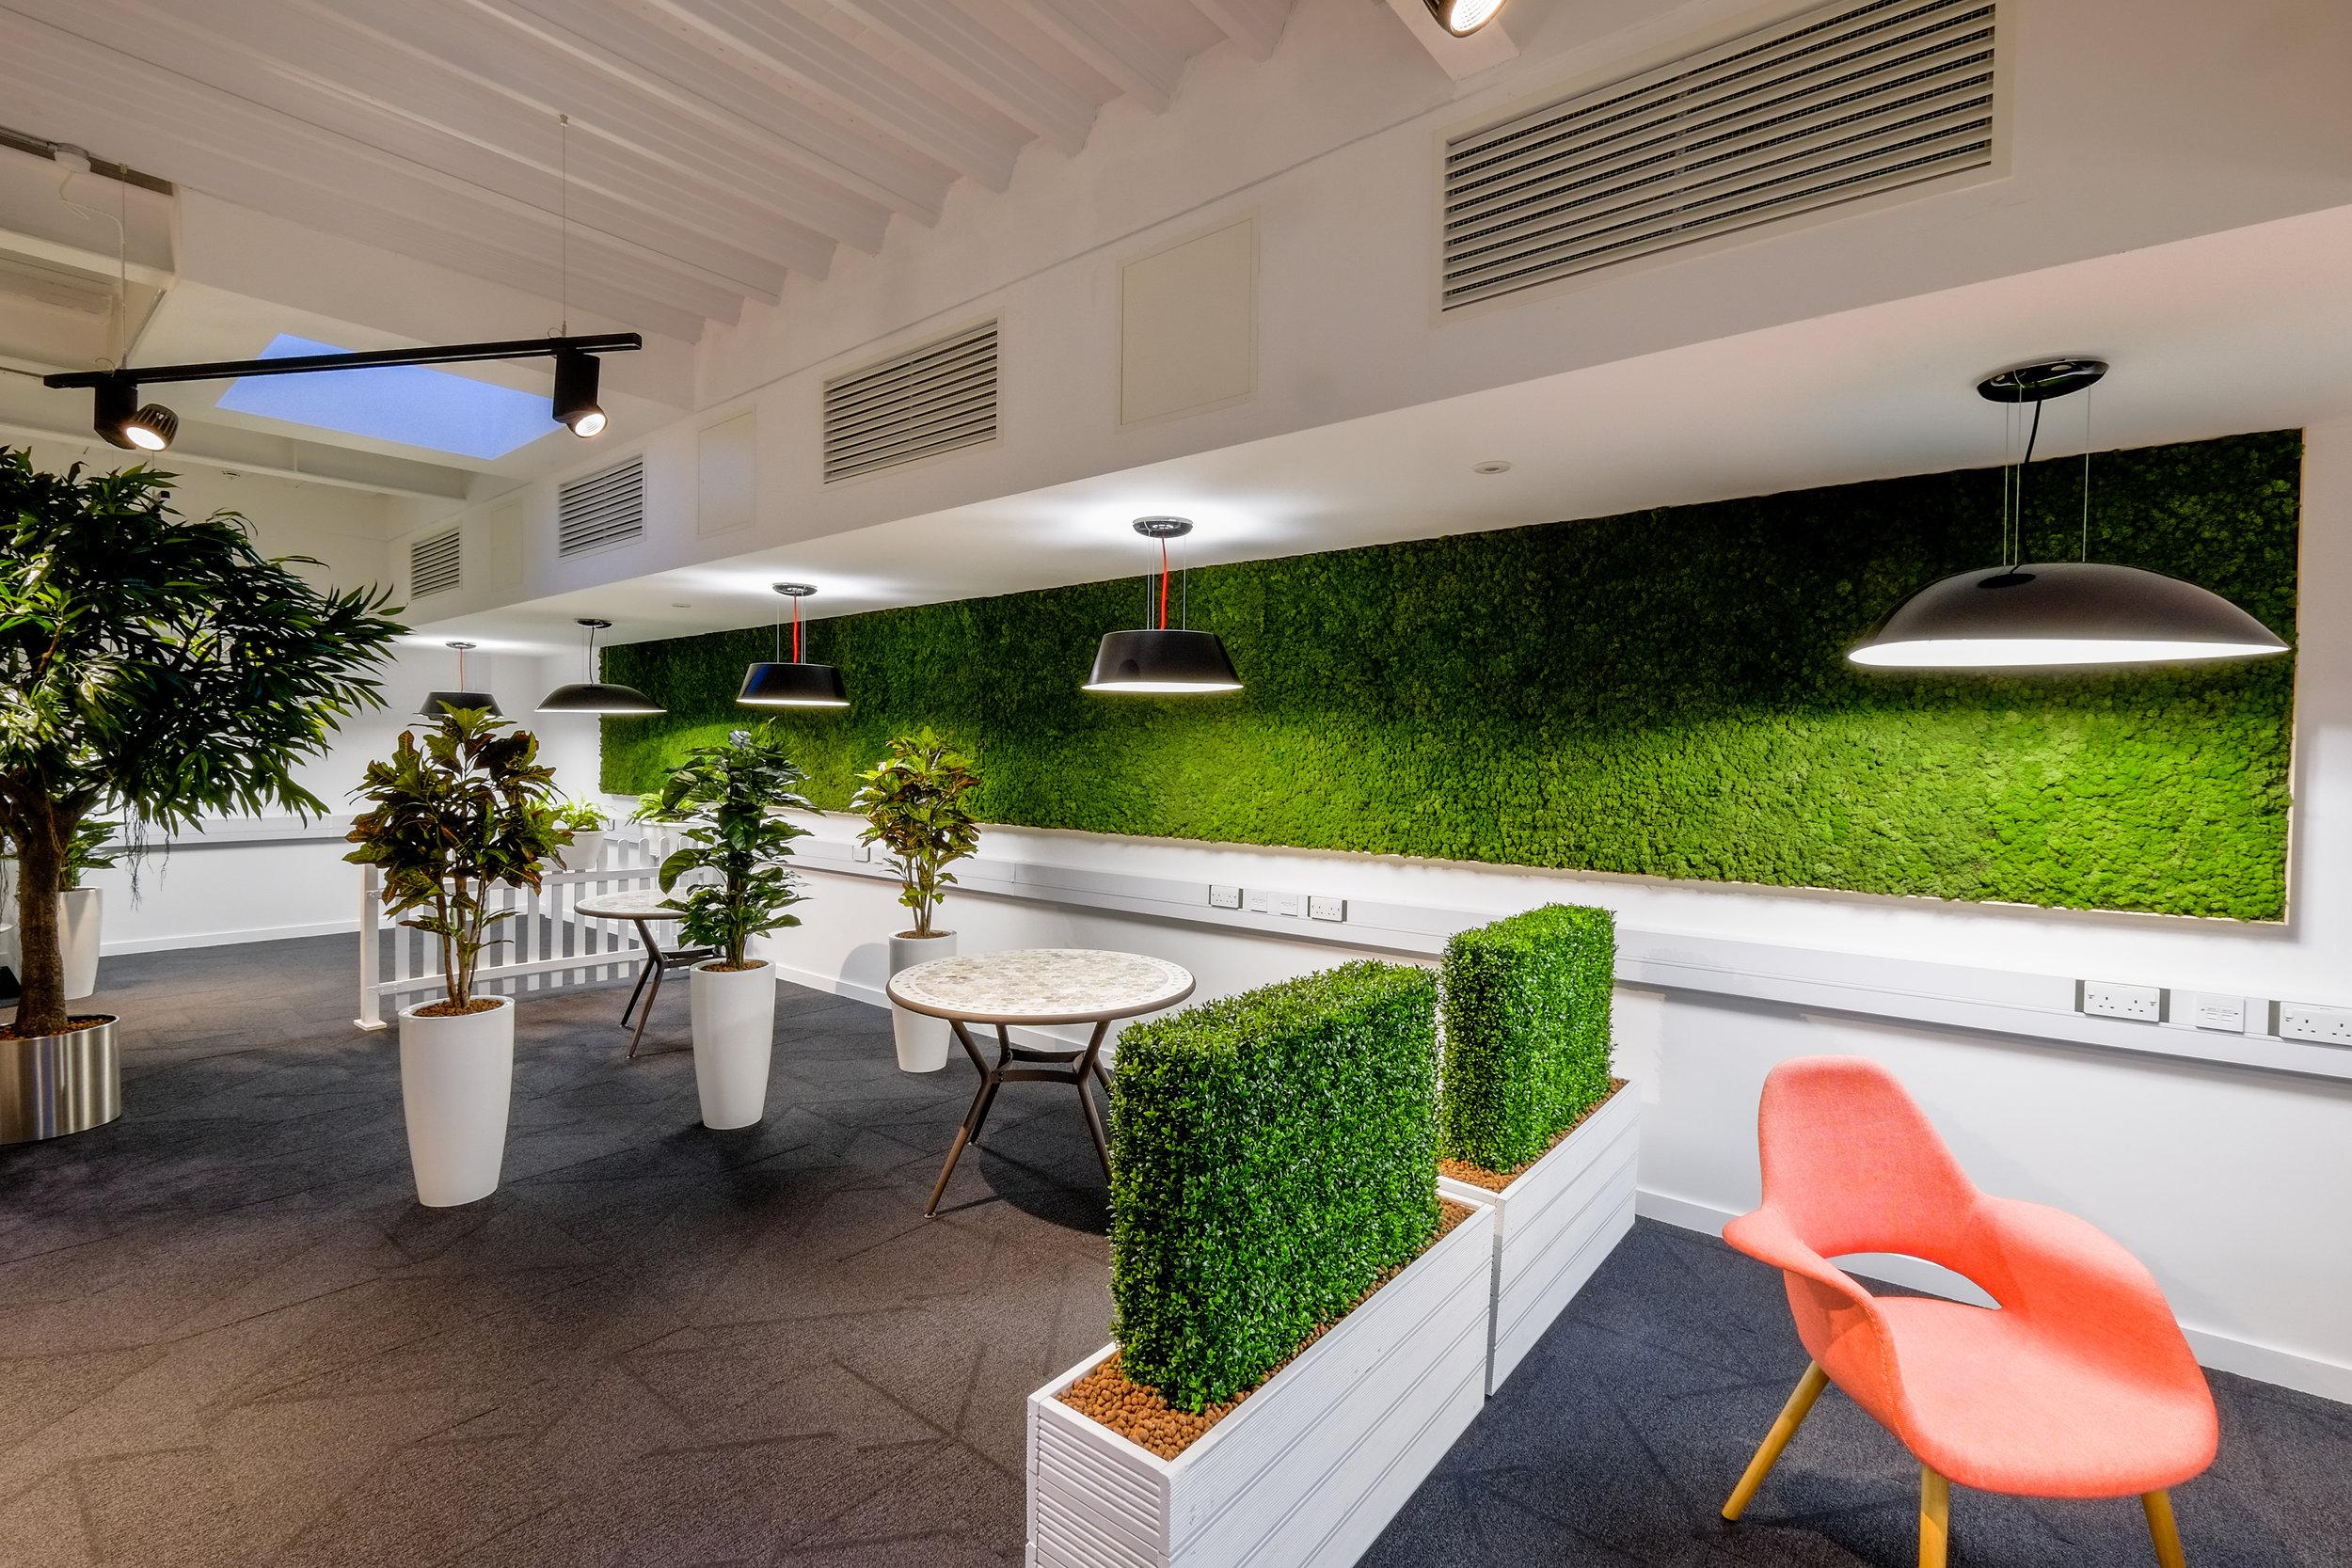 Bernard Crossland Building:  Garden room